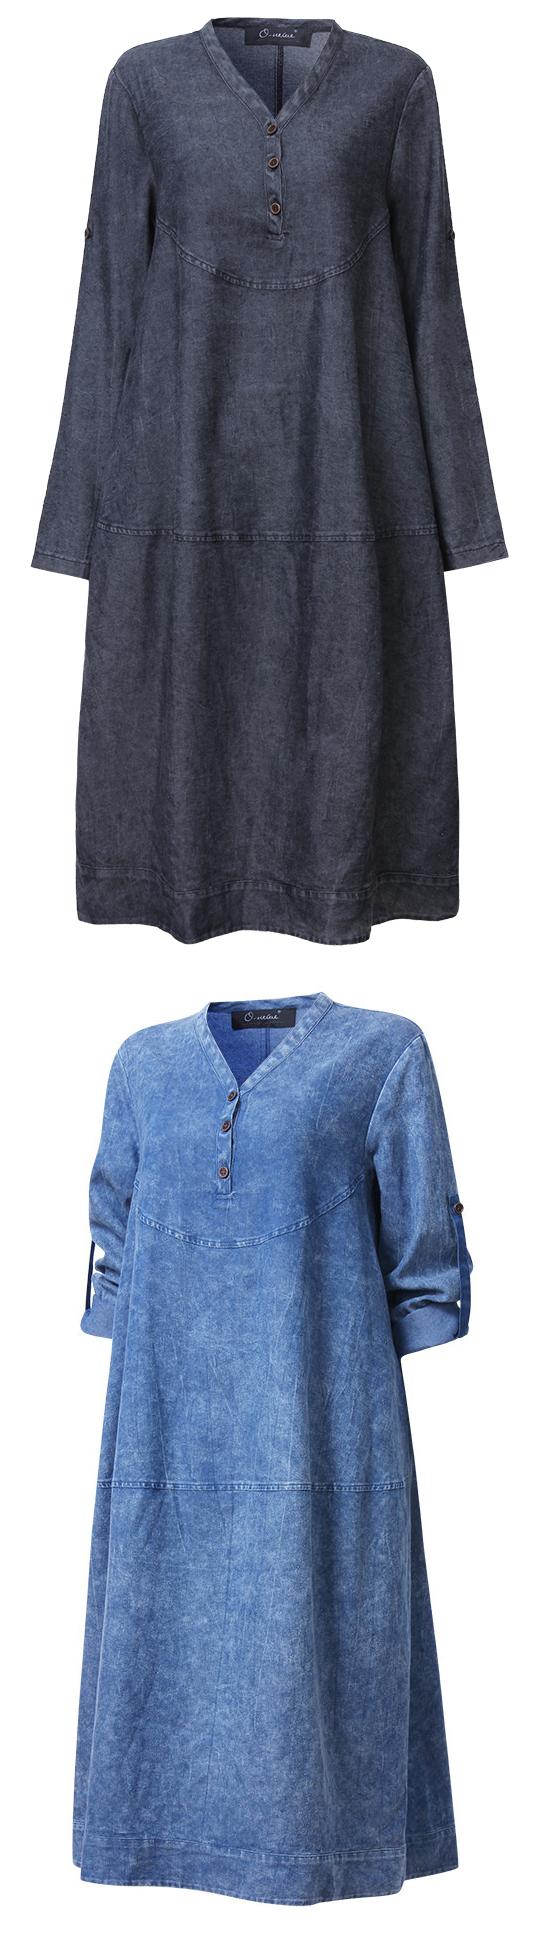 7f3391a96b  26.47 Plus Size Women Loose Solid Long Sleeve Denim Dress Jeans Kleid